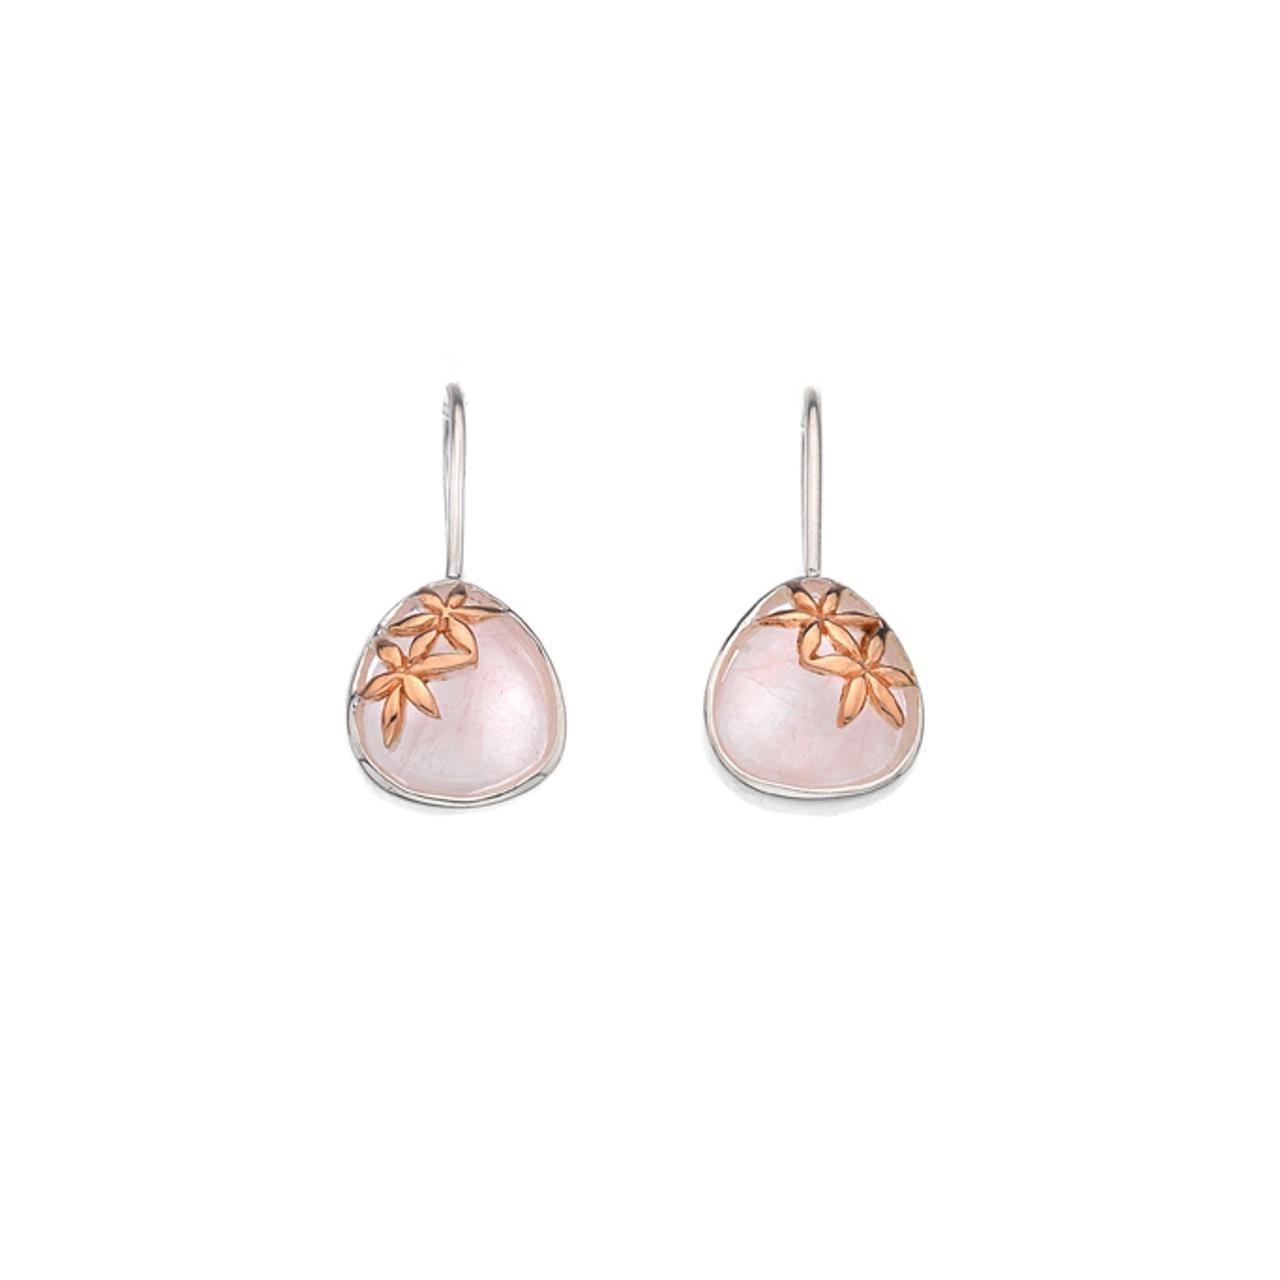 Silver & Rose Gold plated Rose Quartz Drop Earrings